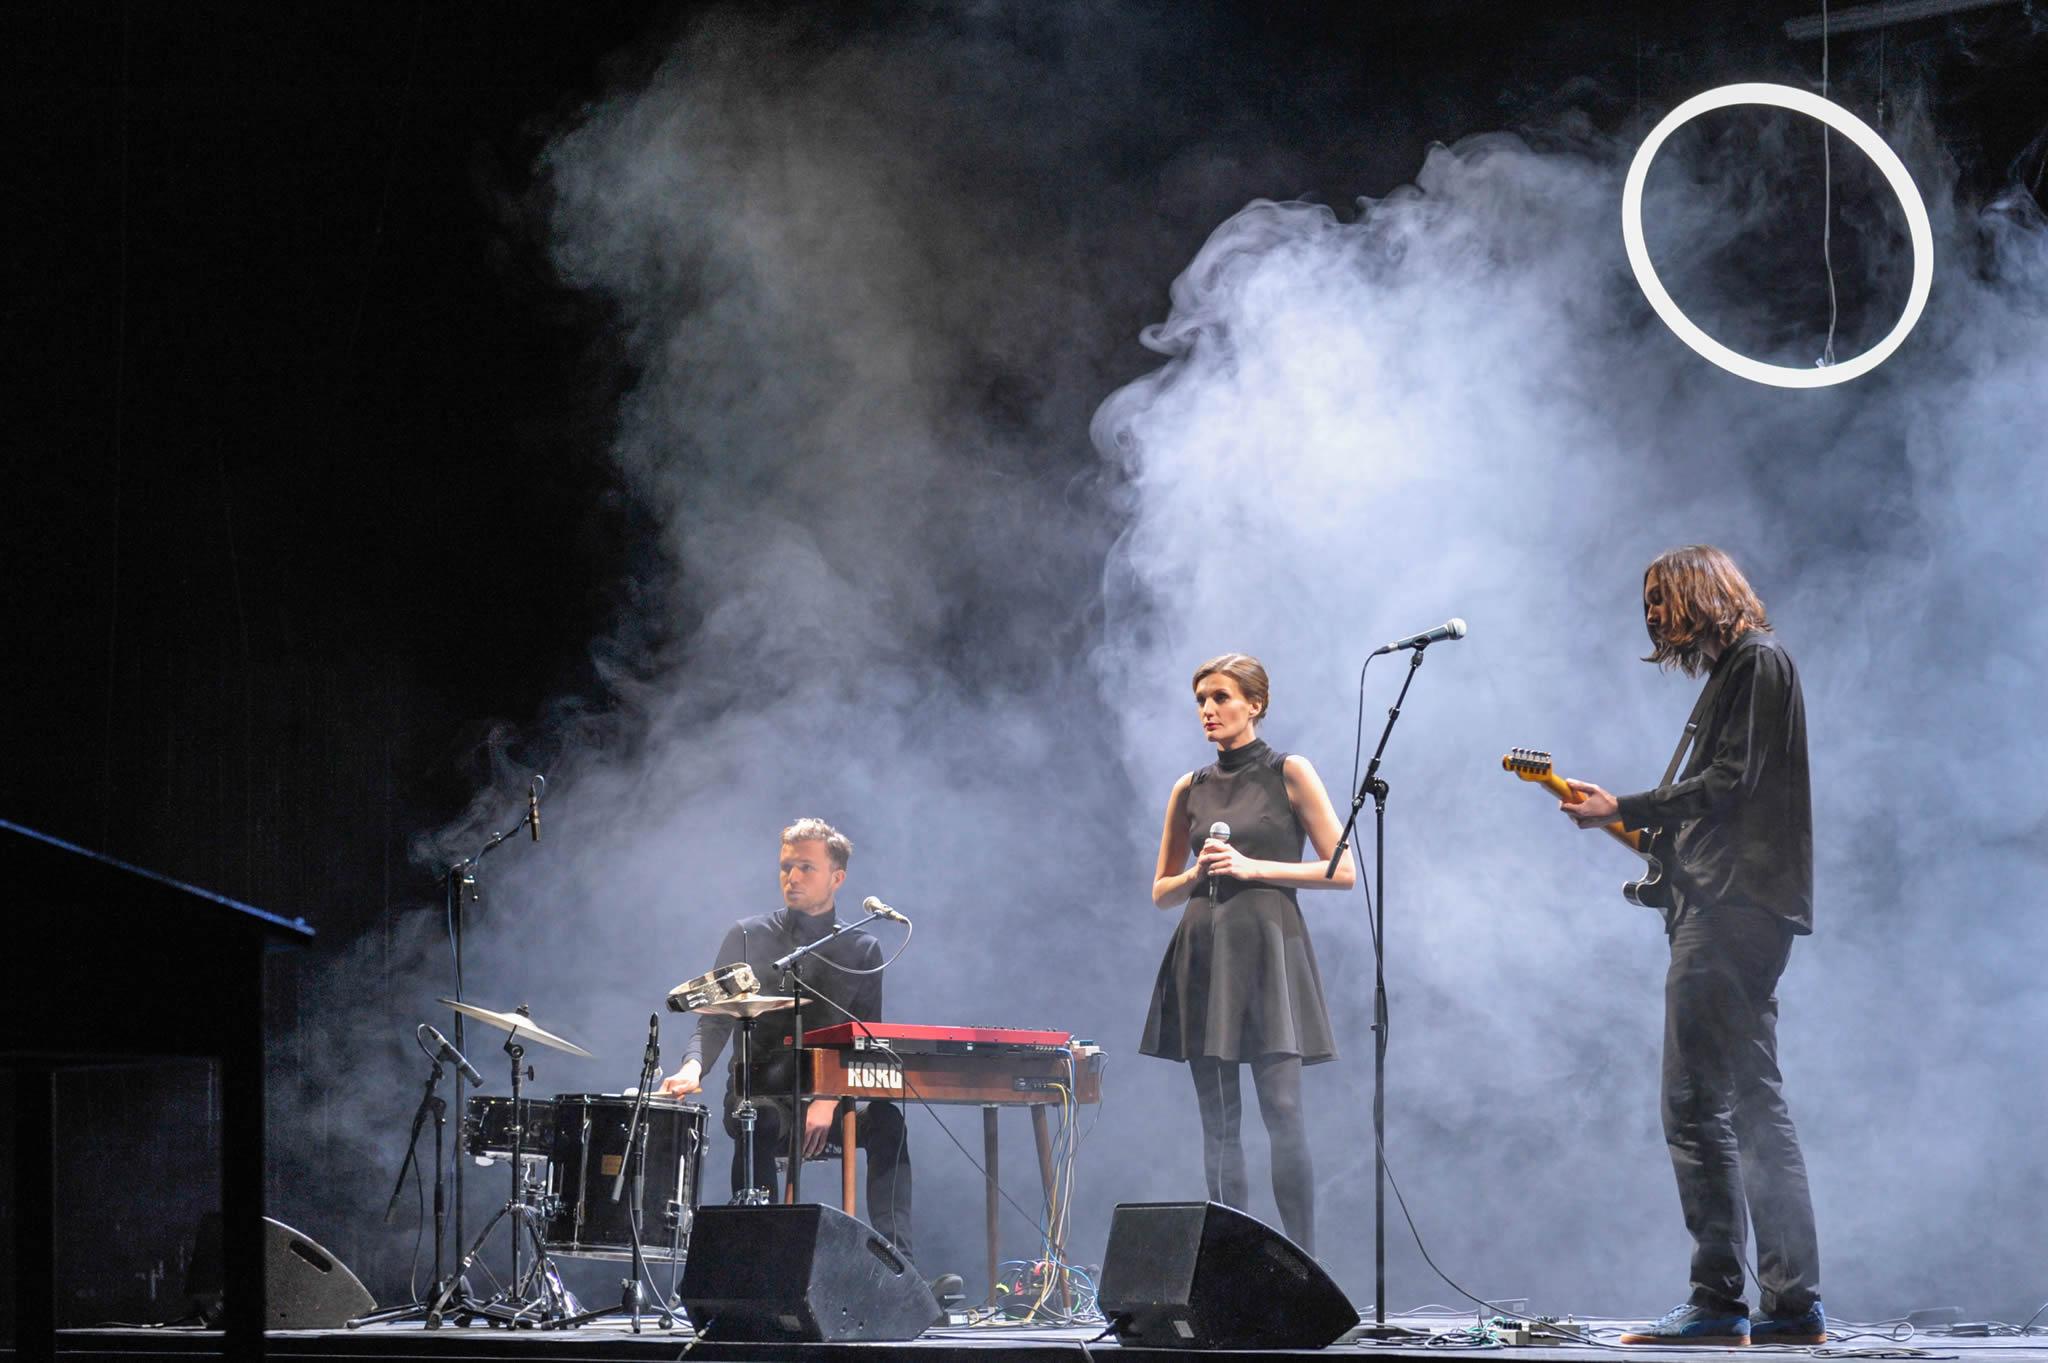 LED-Ringleuchte TheO beim Filmfestival Cottbus